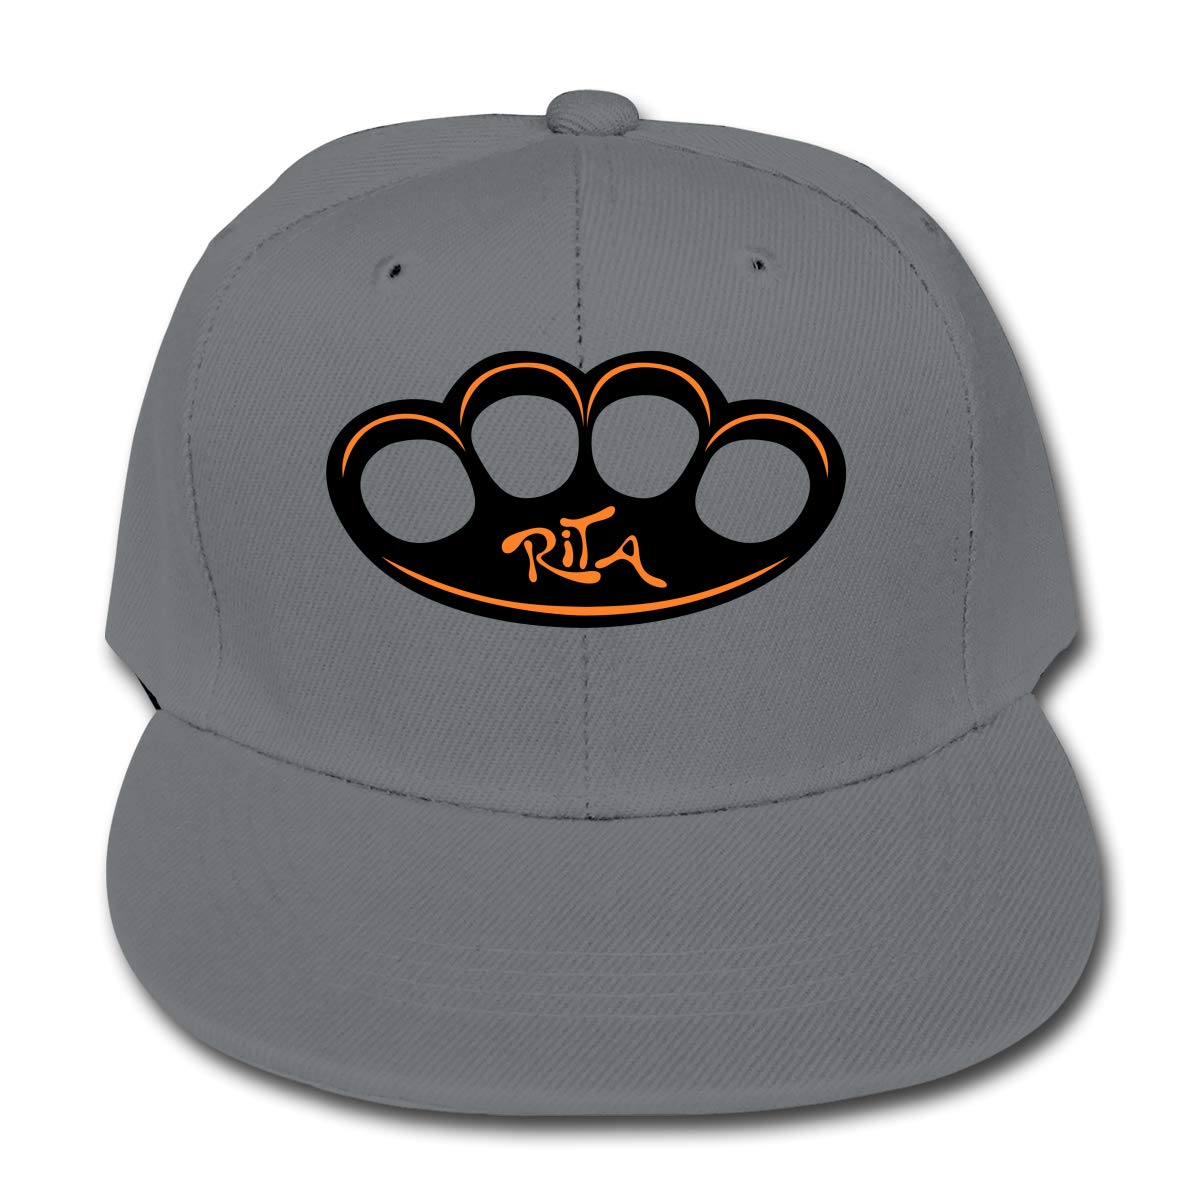 5adf4aad14c69 Amazon.com  Tnigke Rita Sahat iu Ora Kid Camping Baseball Cap Black   Clothing